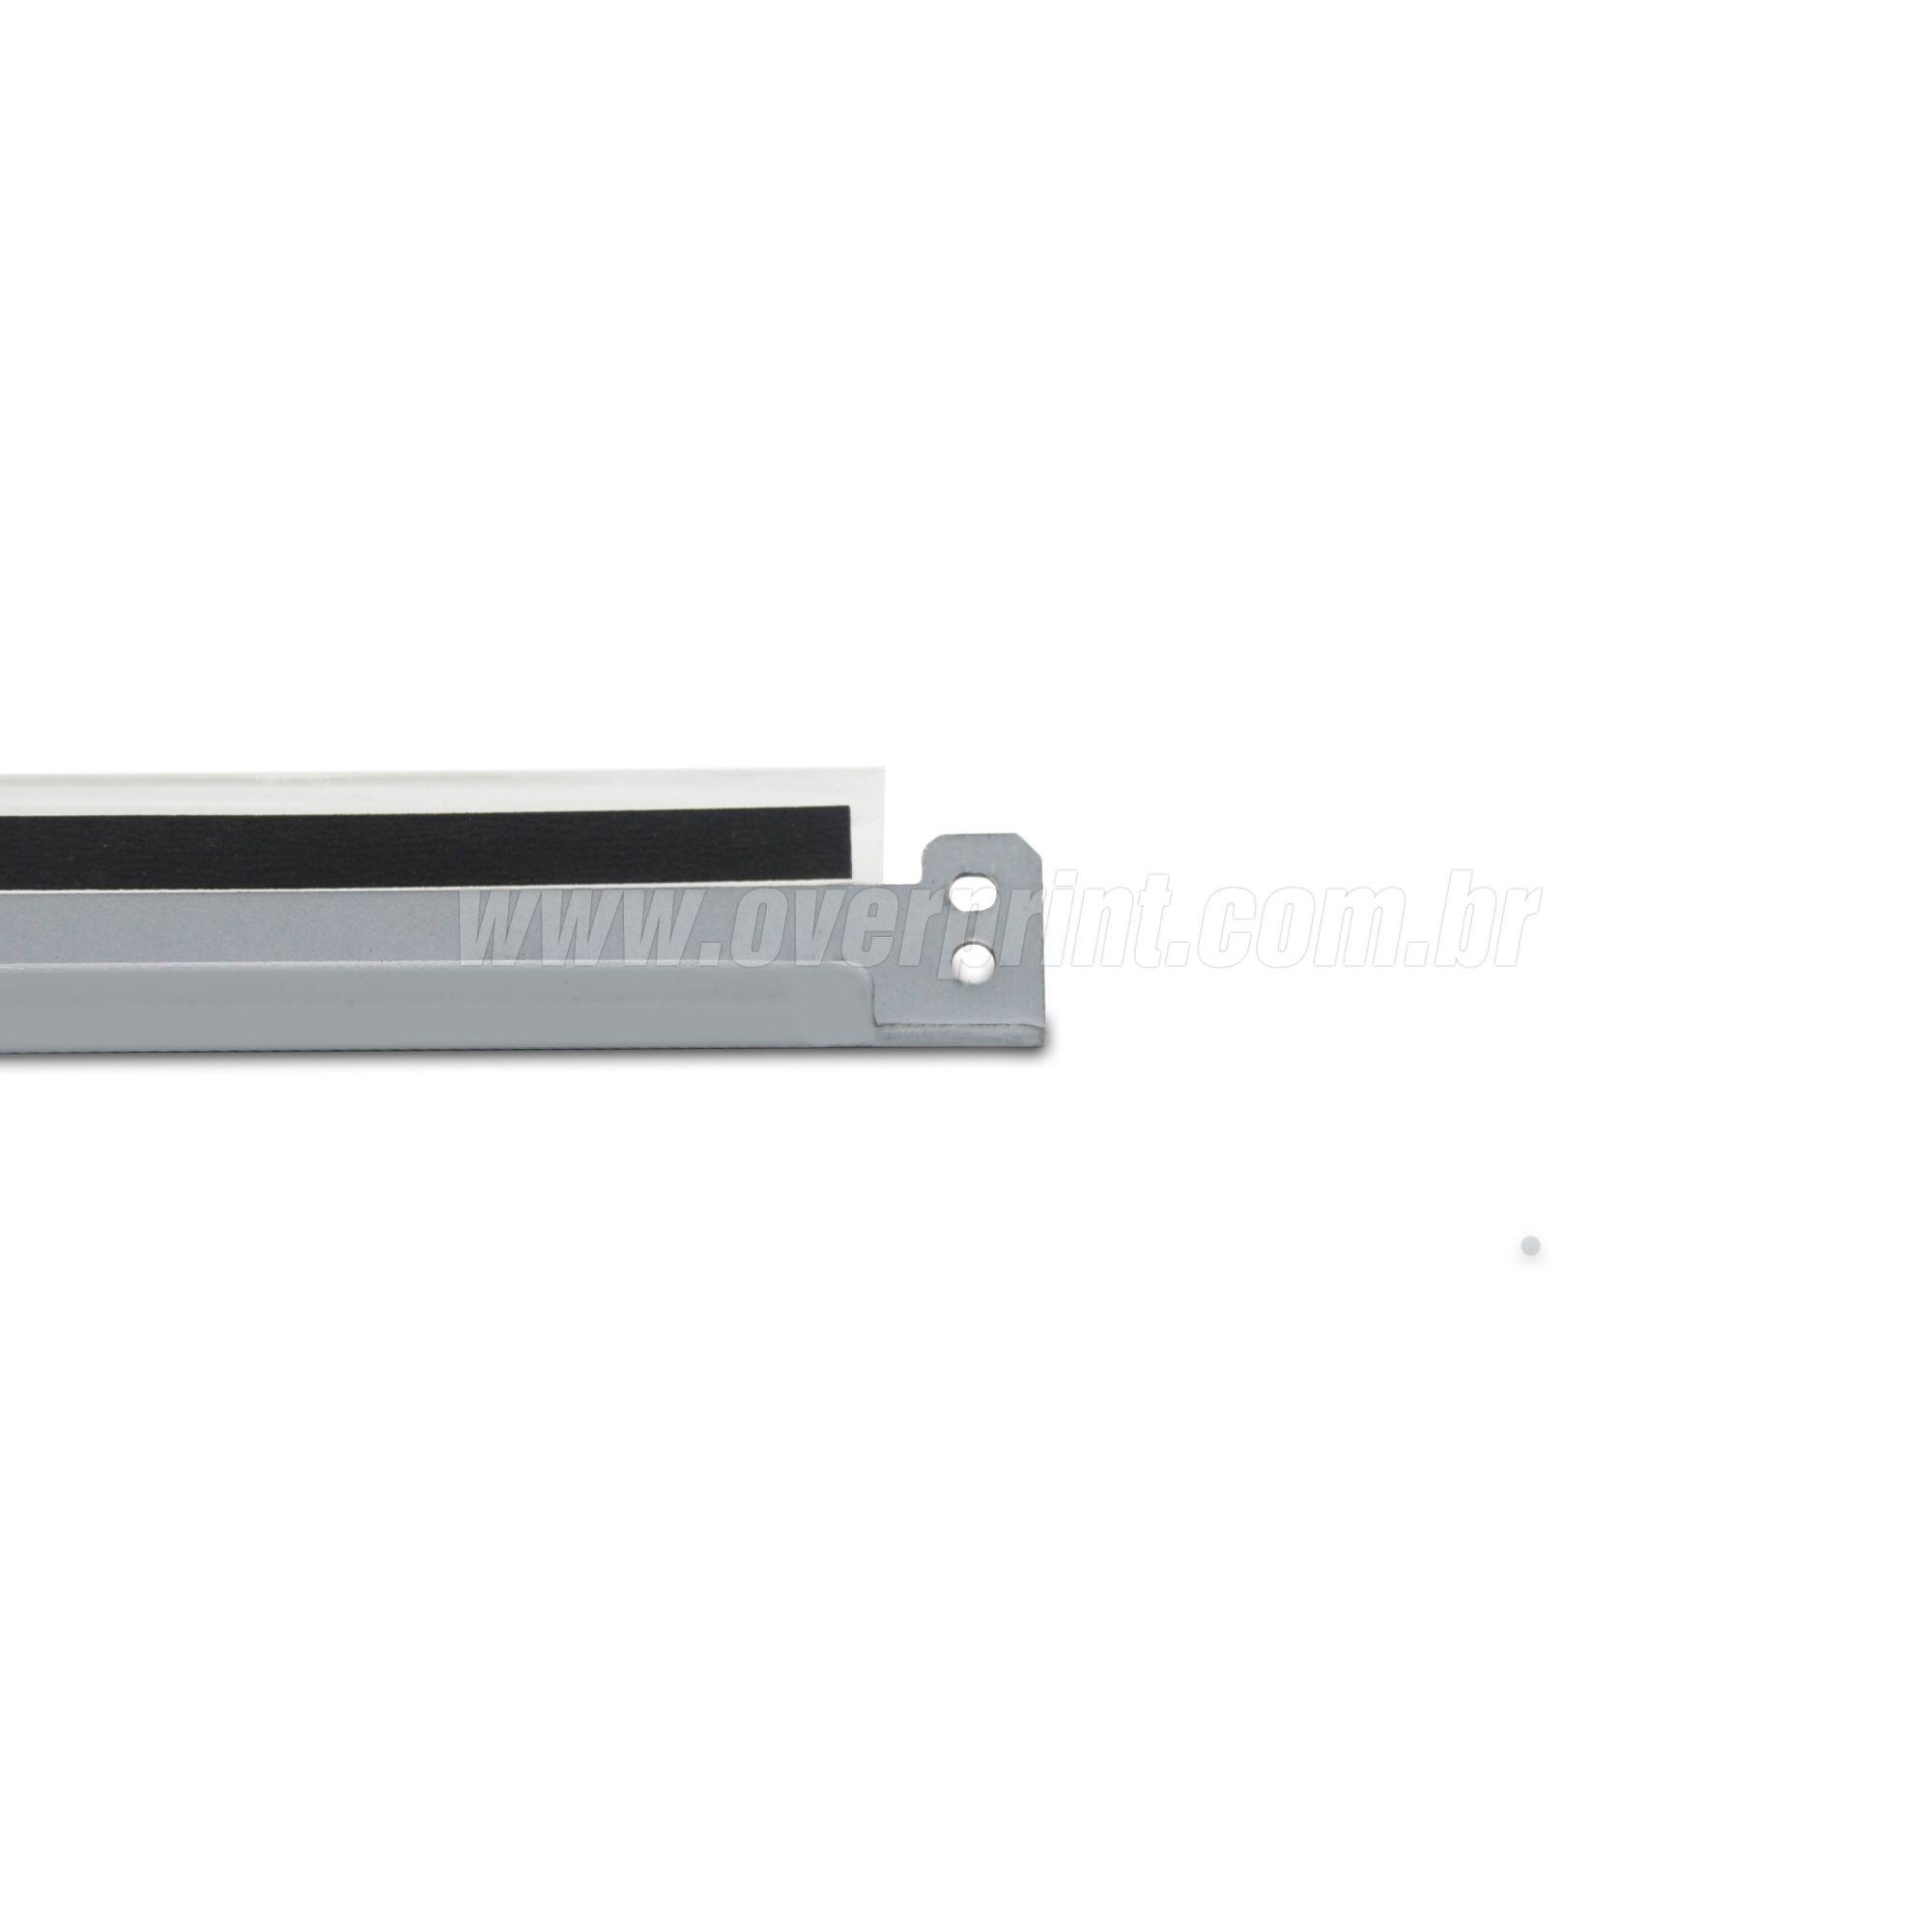 Lâmina de Limpeza da Belt Xerox DocuColor 240/242/250/252/260 - Overprint